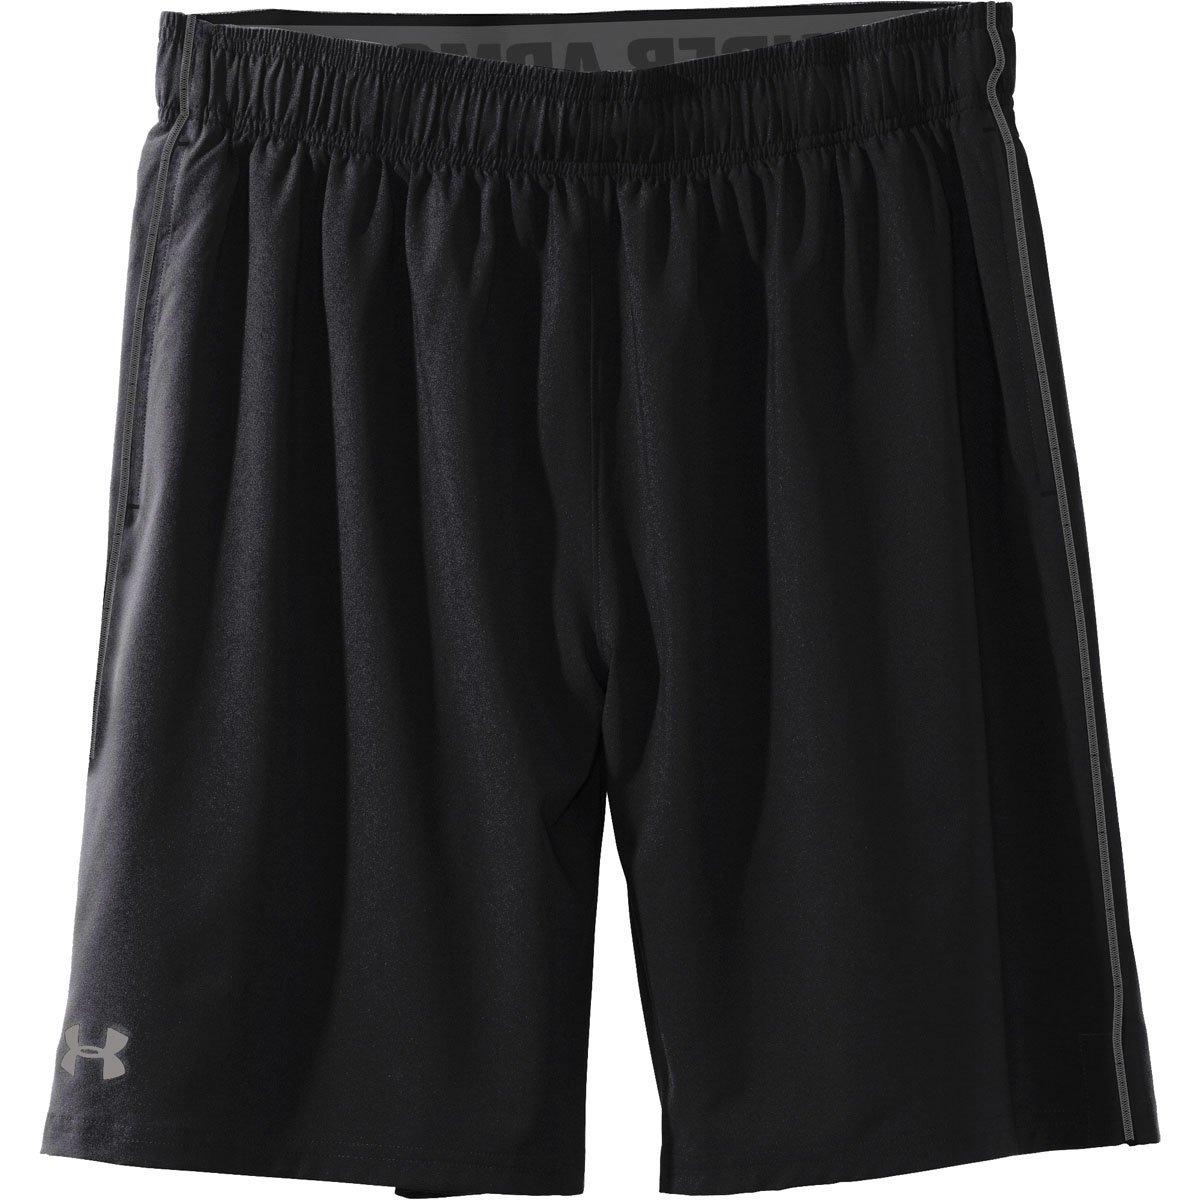 Under Armour Men's UA Raid 10'' Shorts pure black/X-LARGE